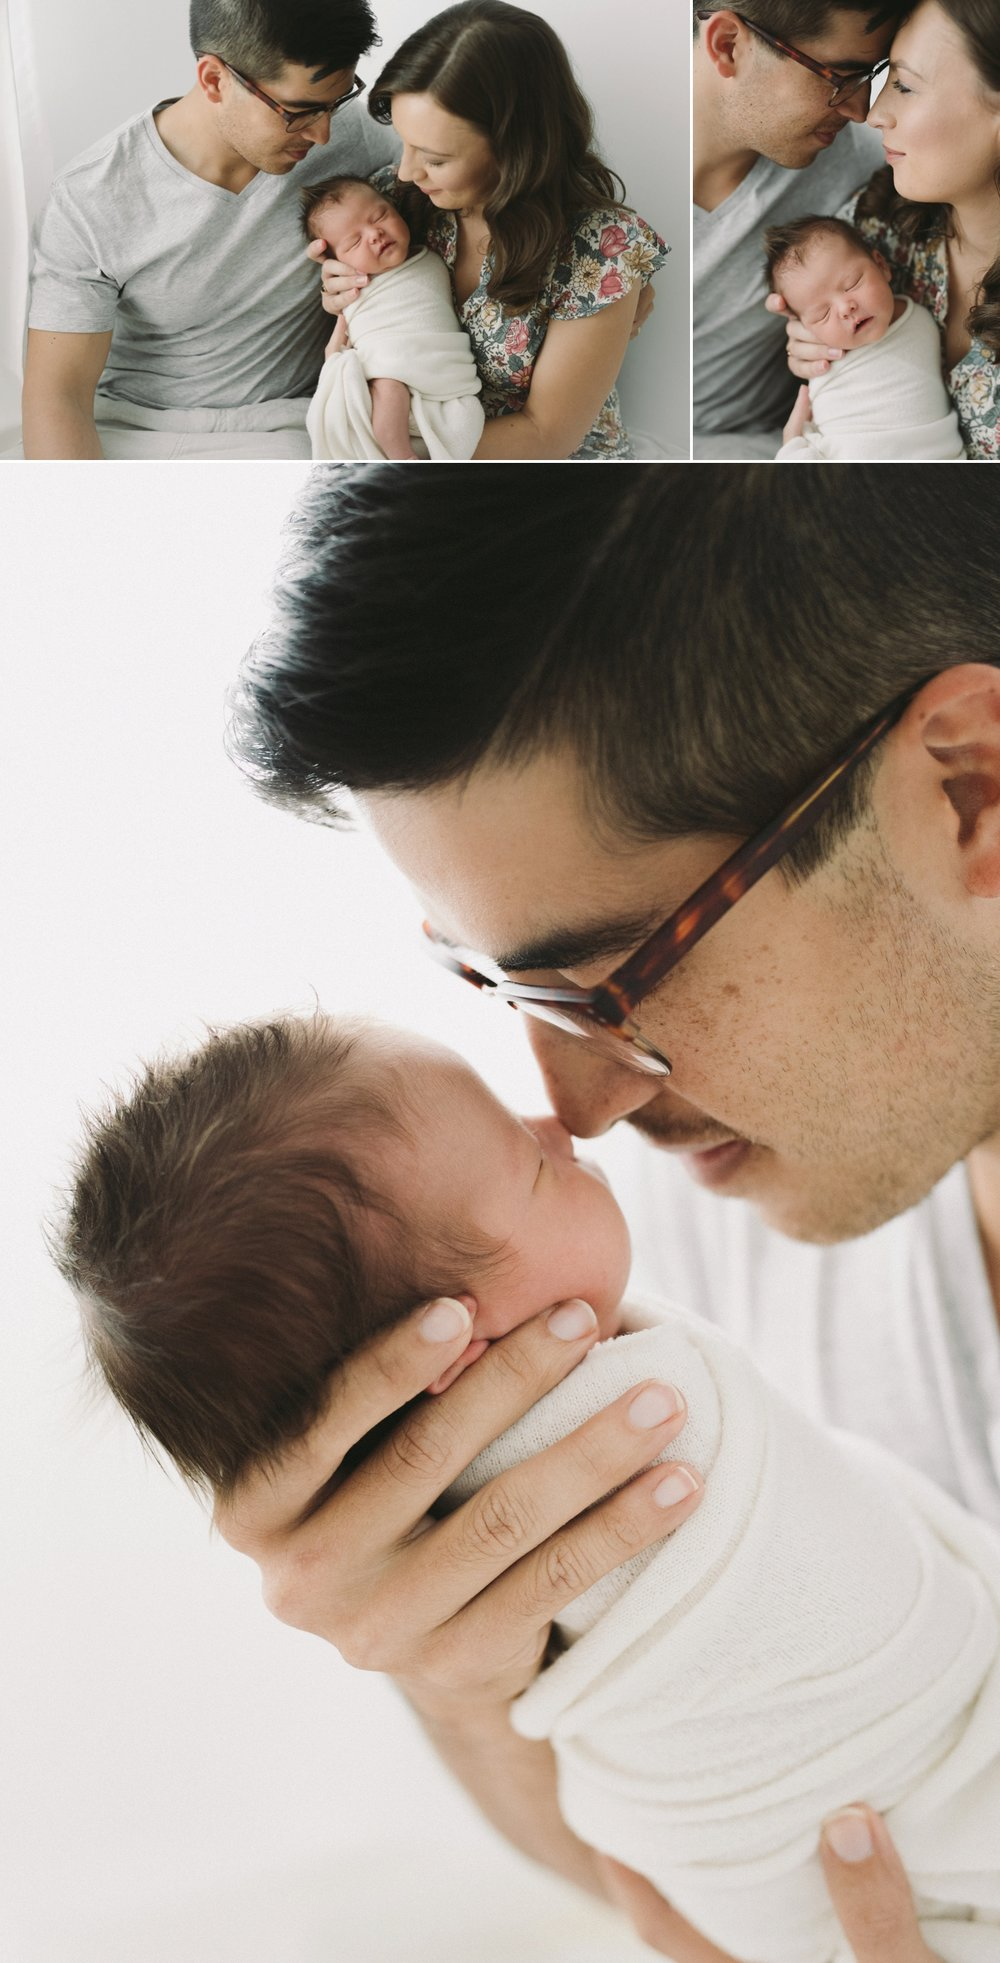 Baby Francis - Natural Newborn Photographer in Adelaide - Simple, modern & beautiful newborn photography - Katherine Schultz - www.katherineschultzphotography.com_0010.jpg